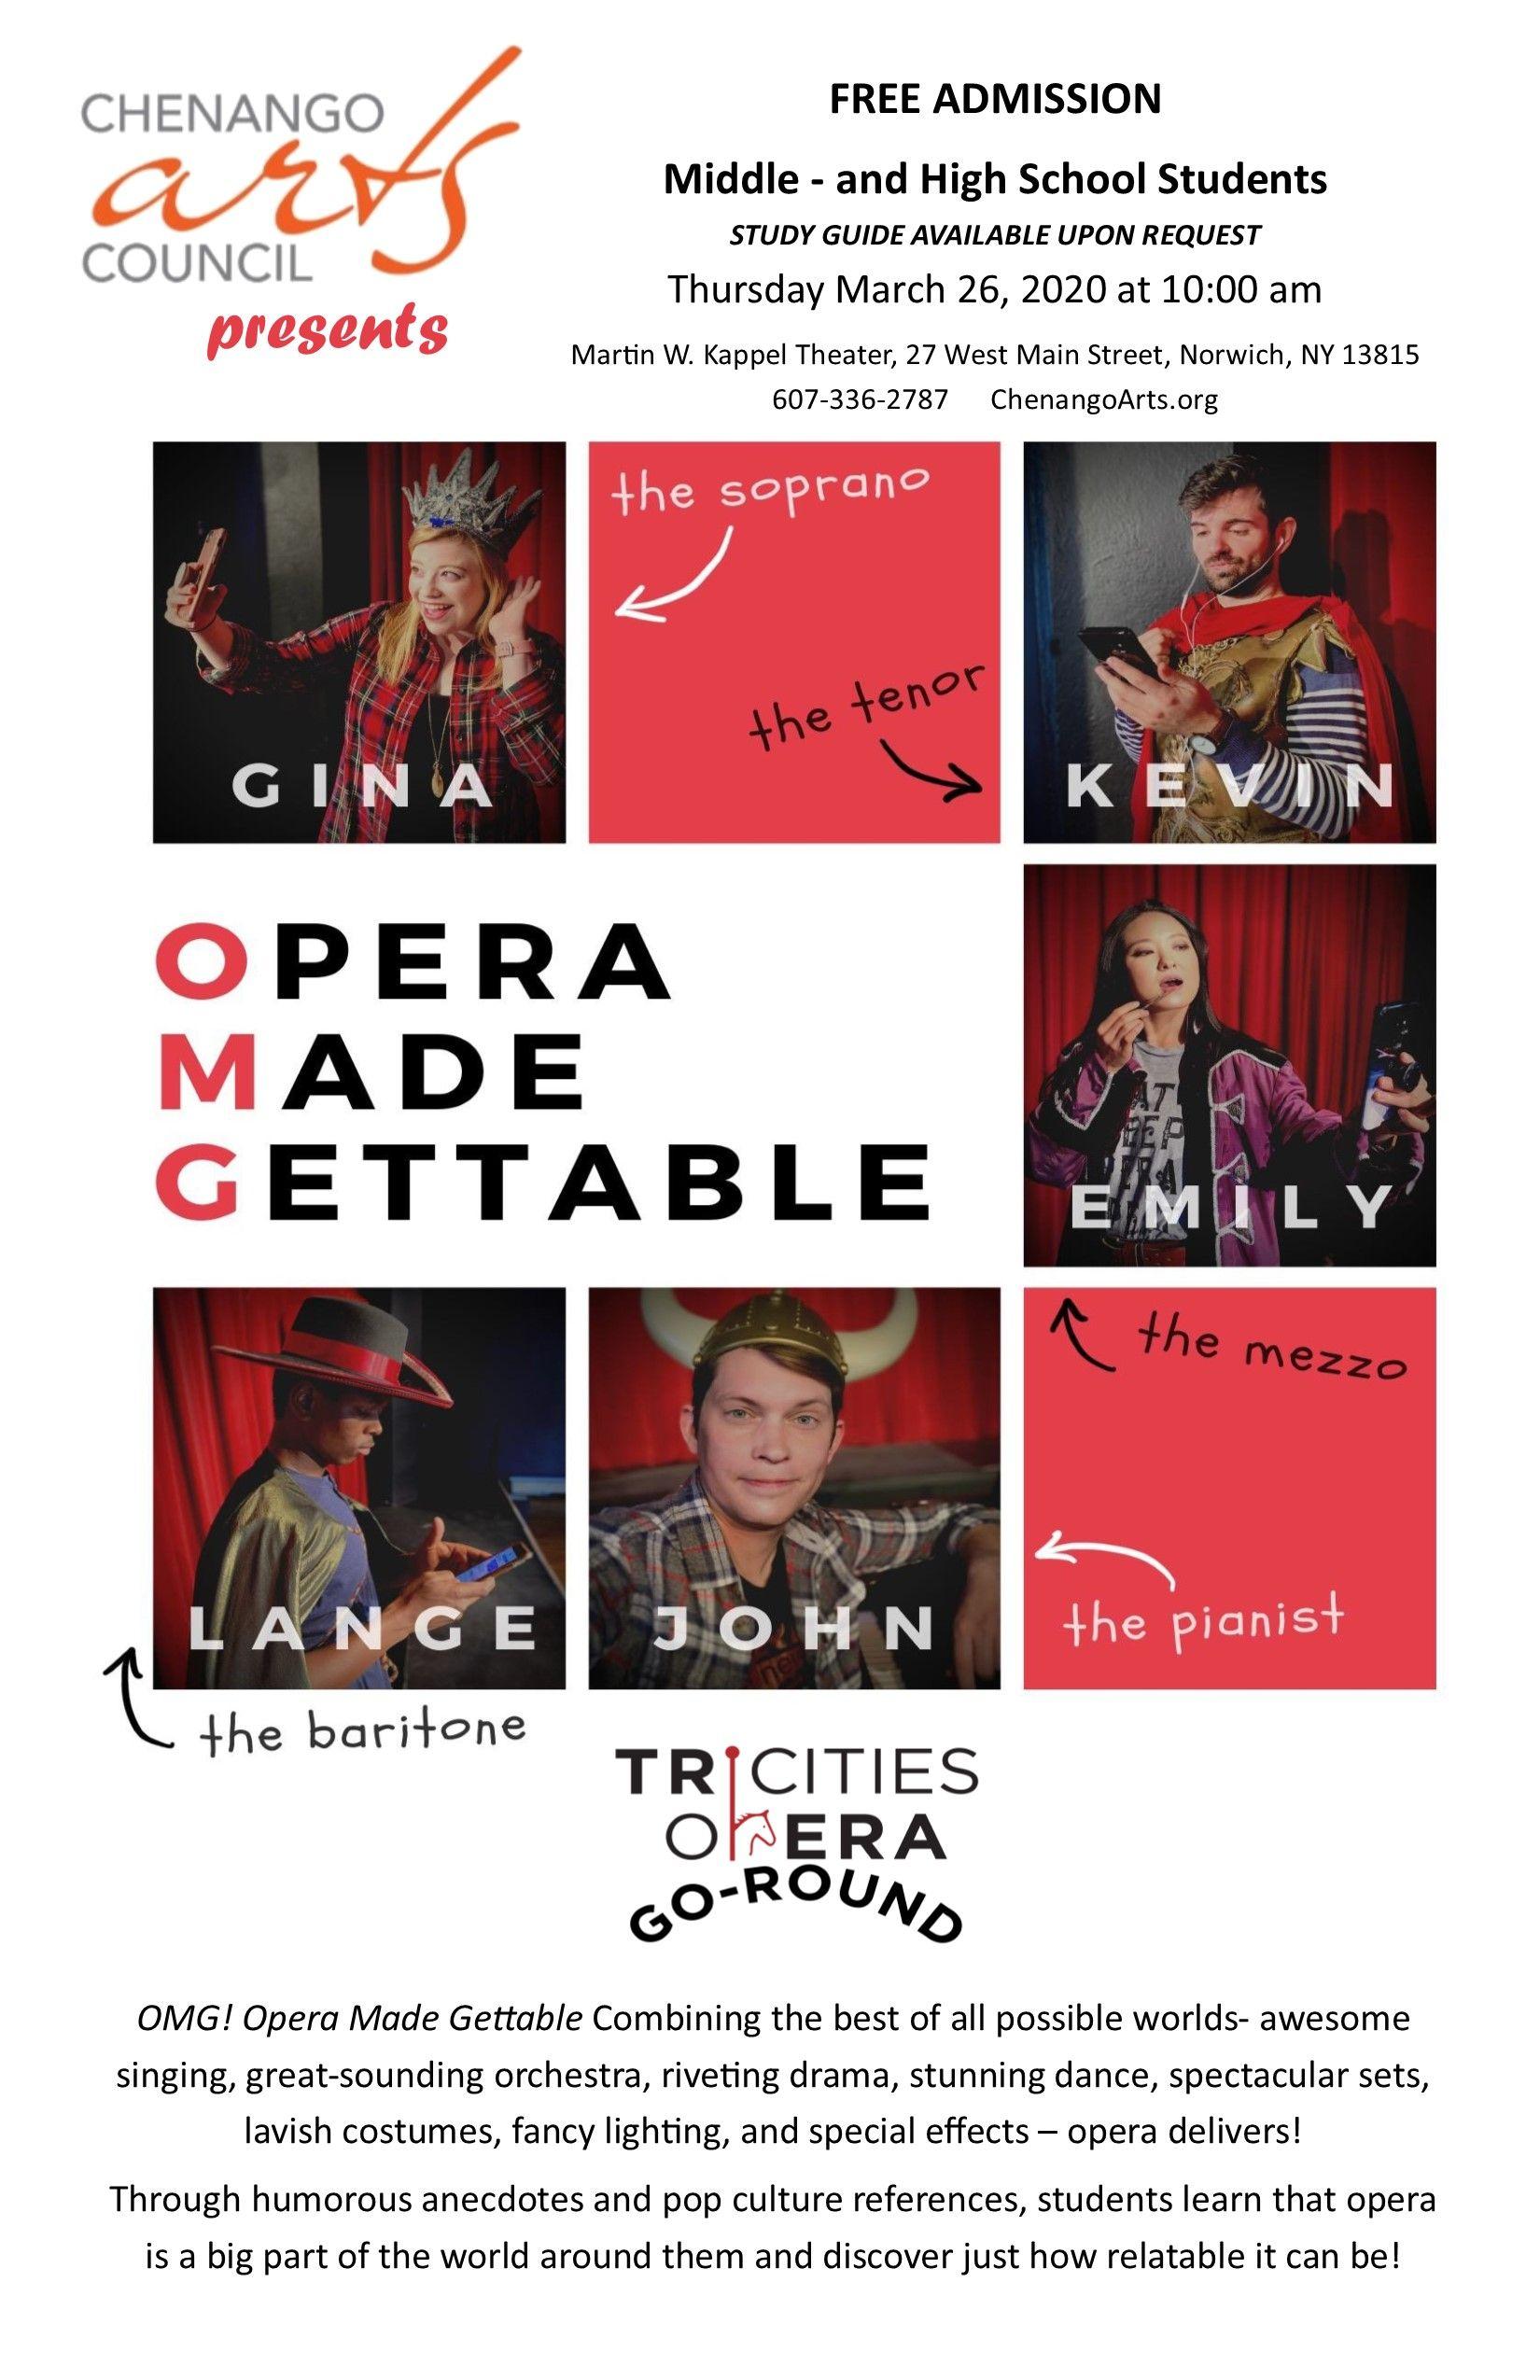 Opera Made Getable!